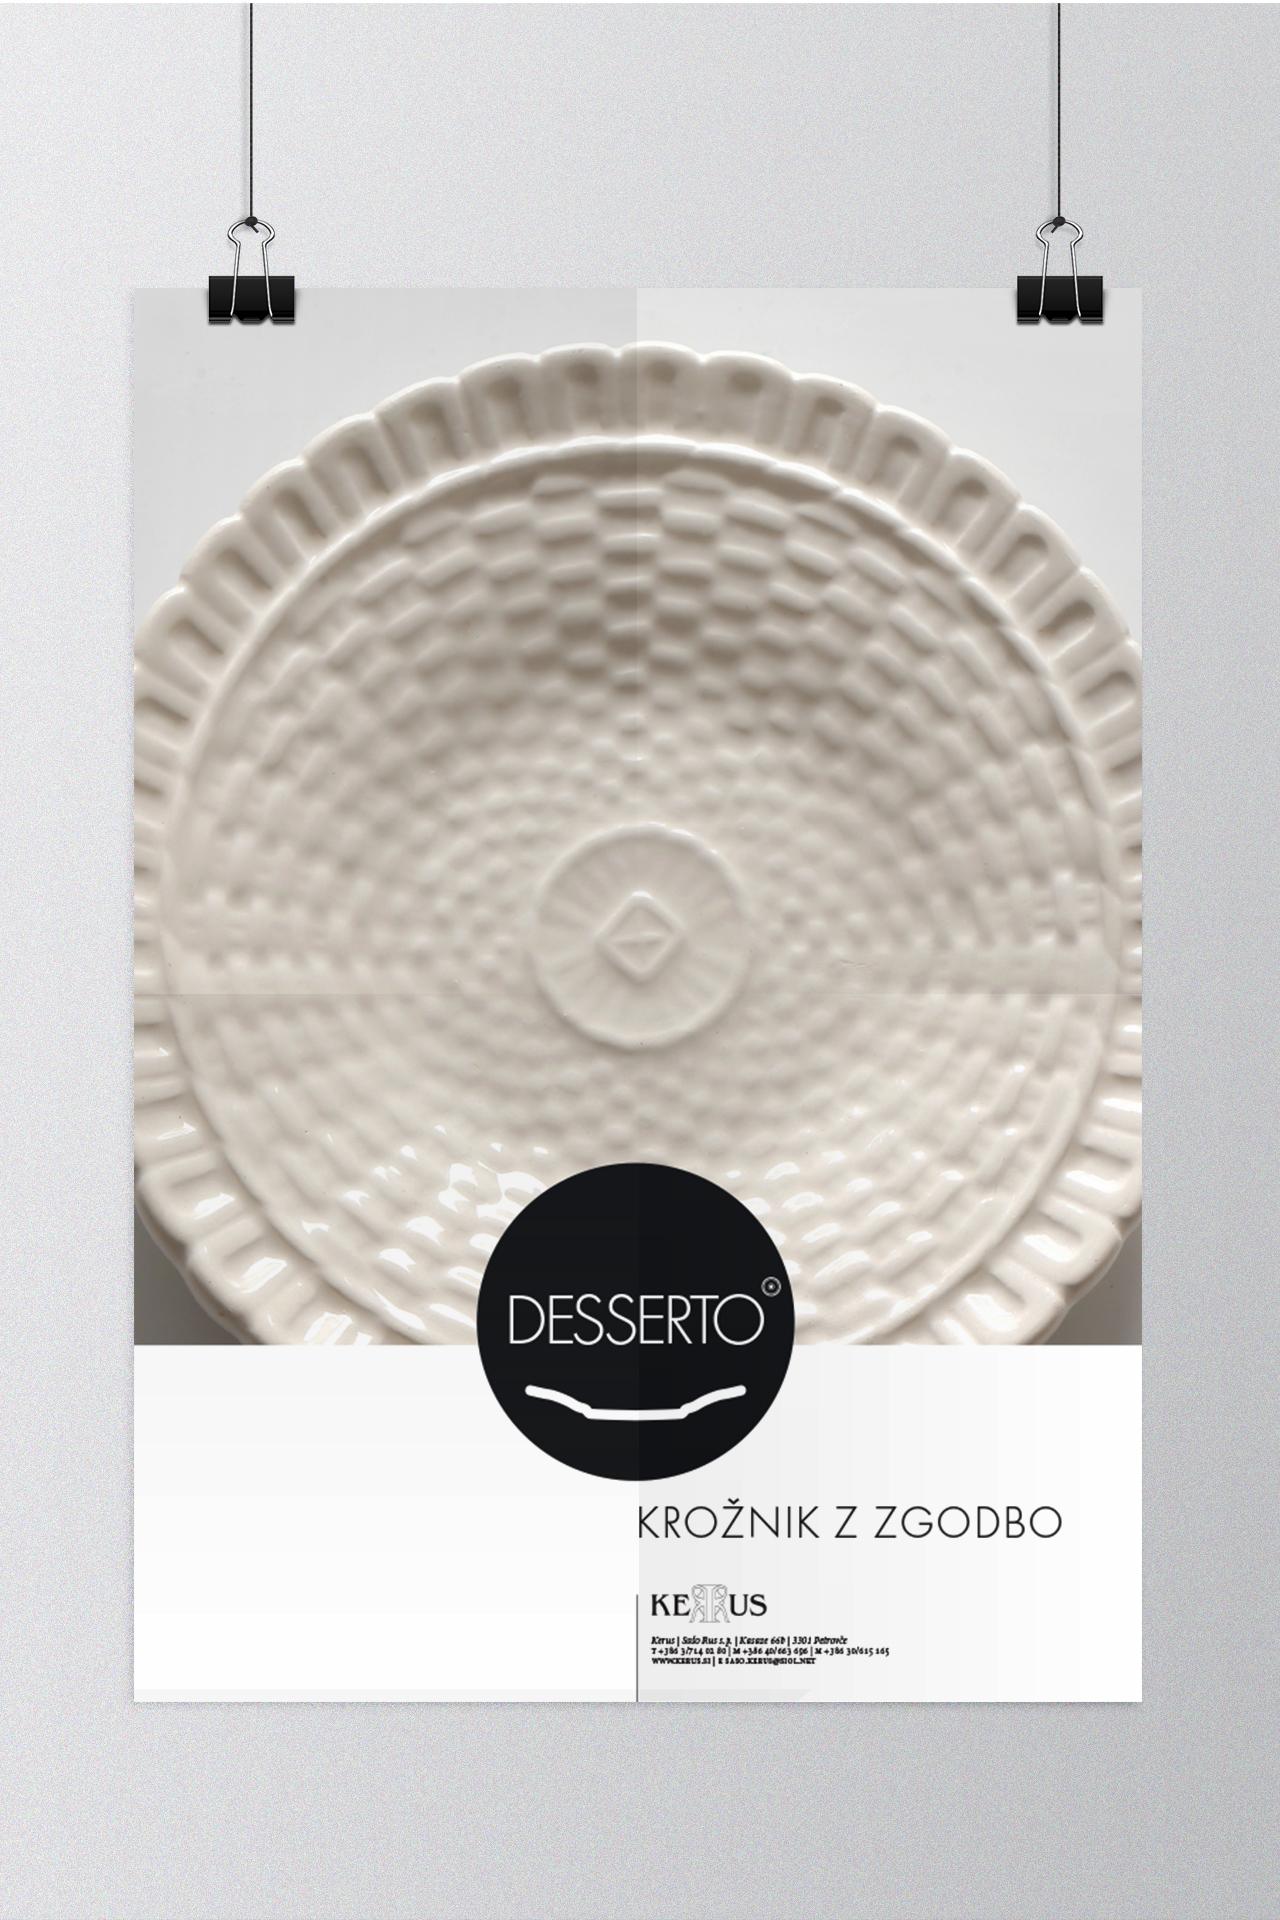 desserto_plakat